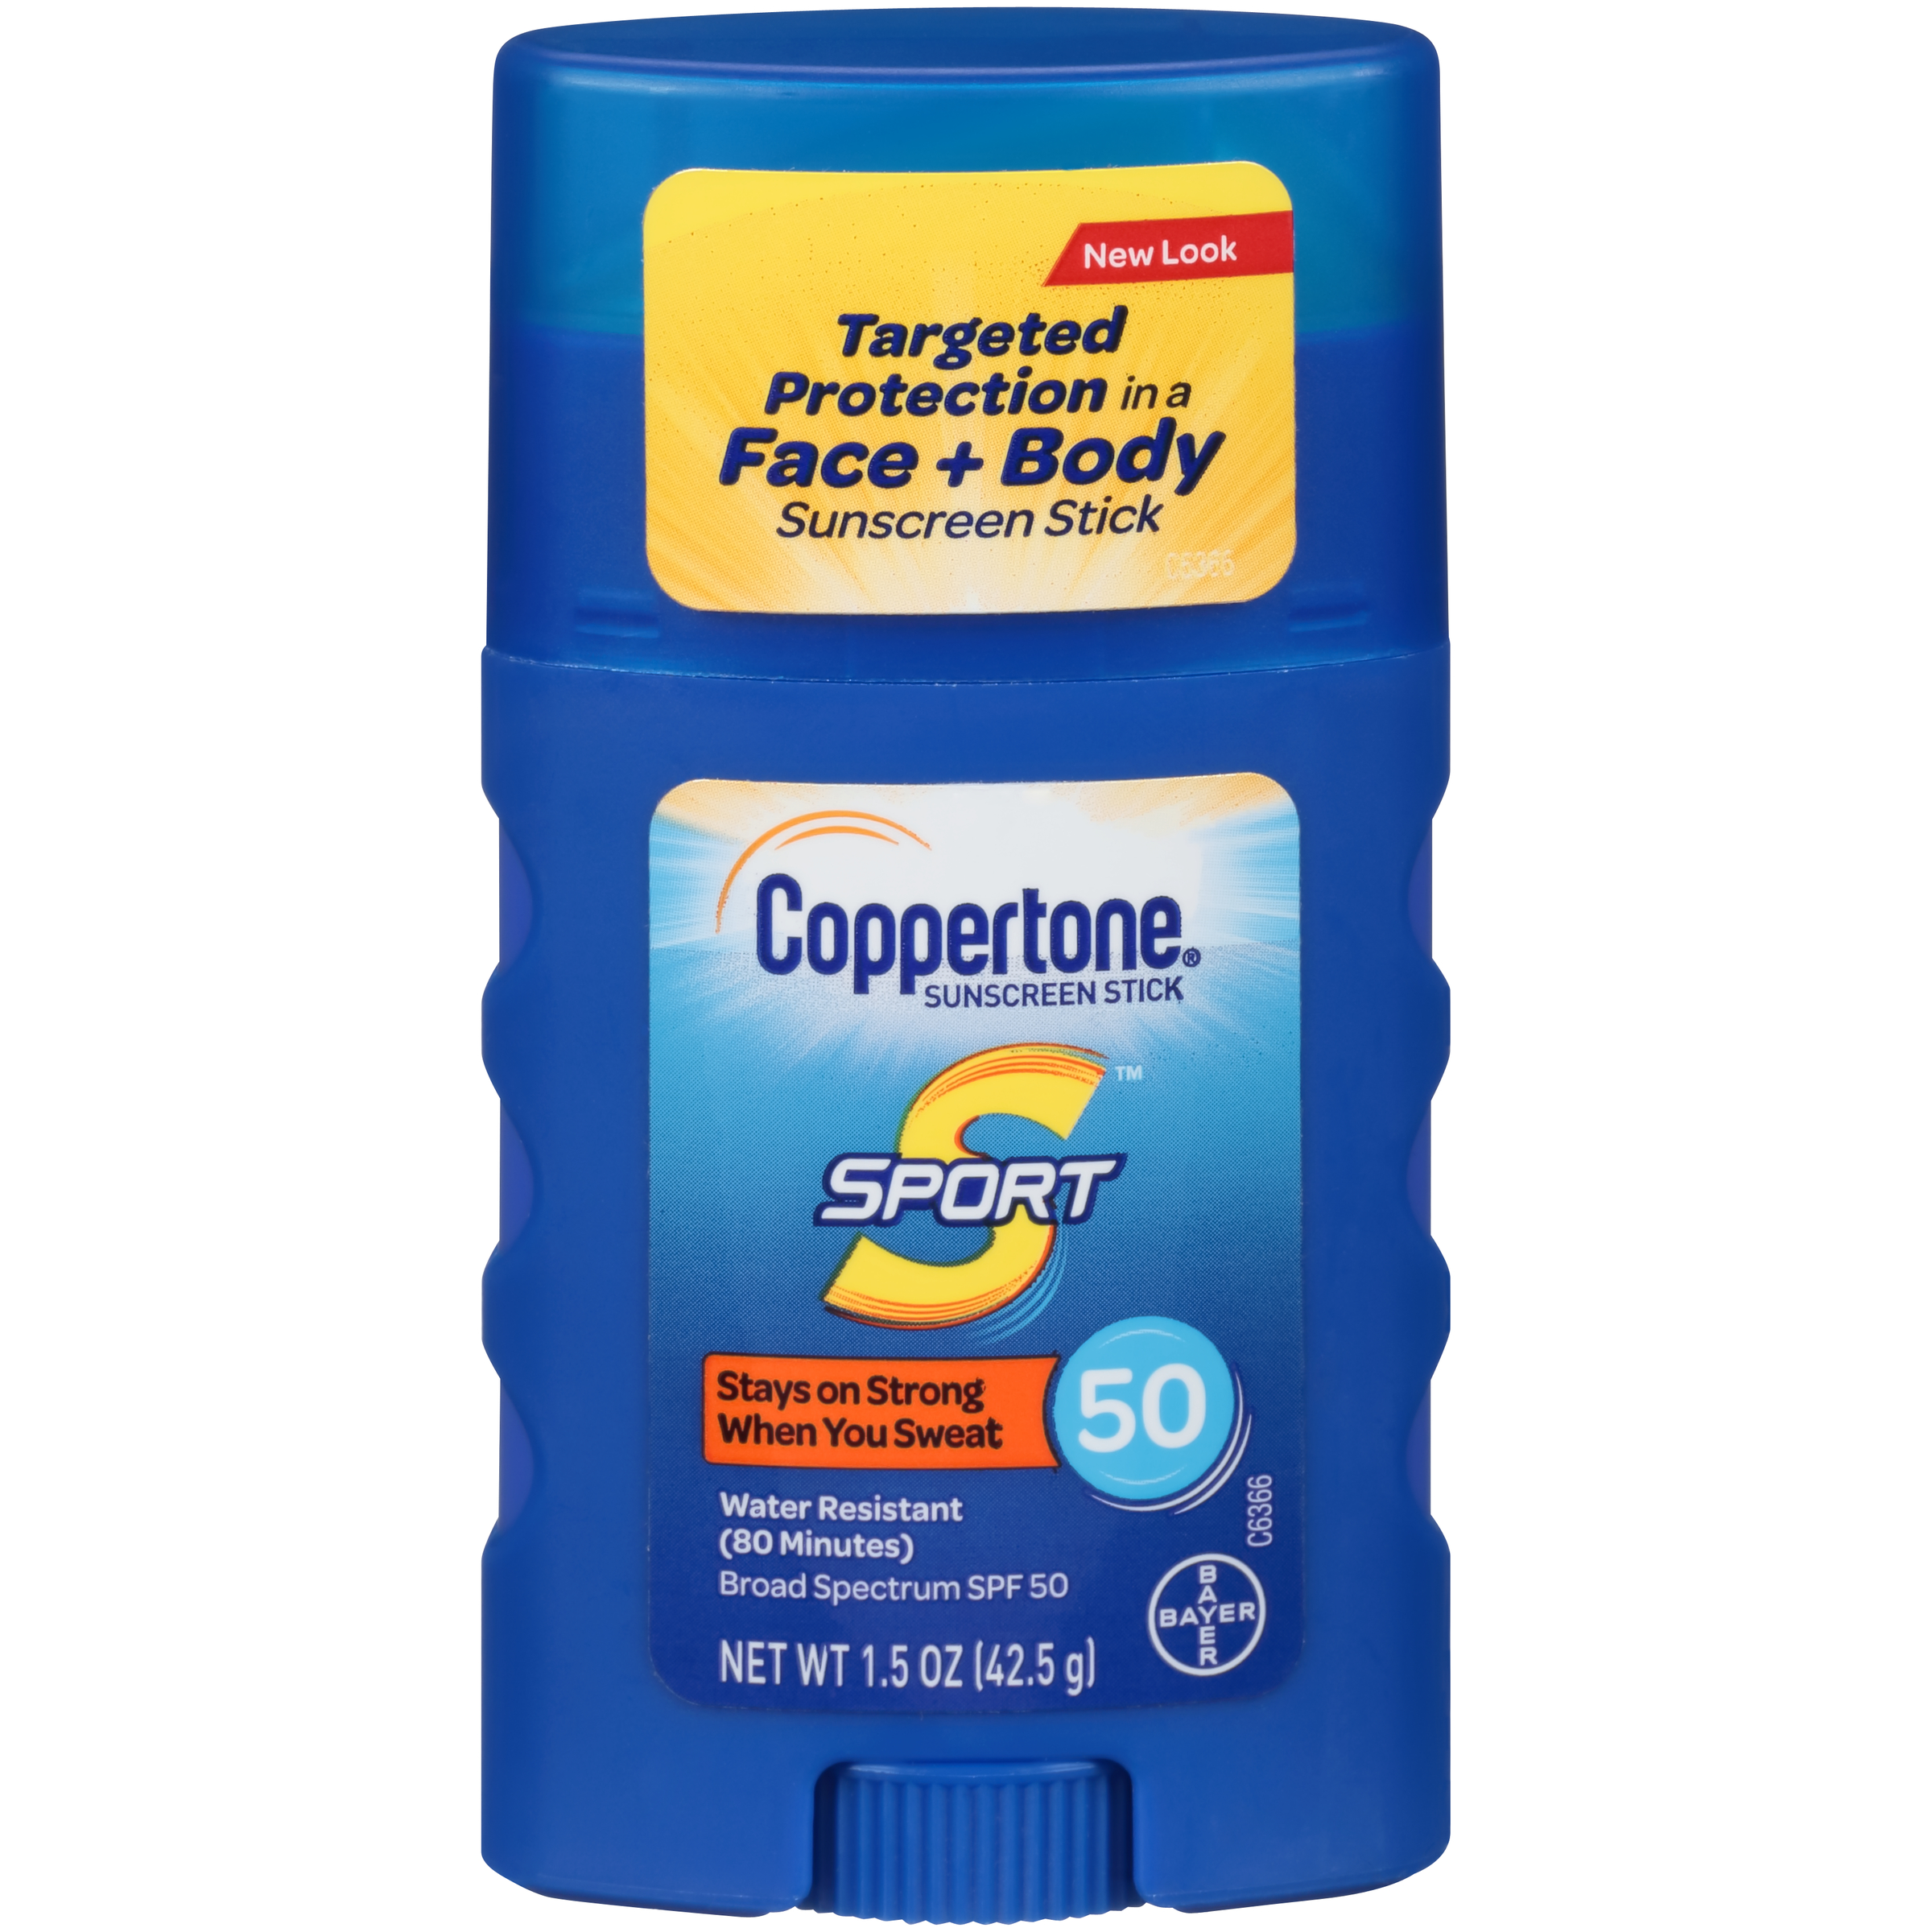 Coppertone Sport Sunscreen Stick SPF 50, 1.5 oz Travel Size